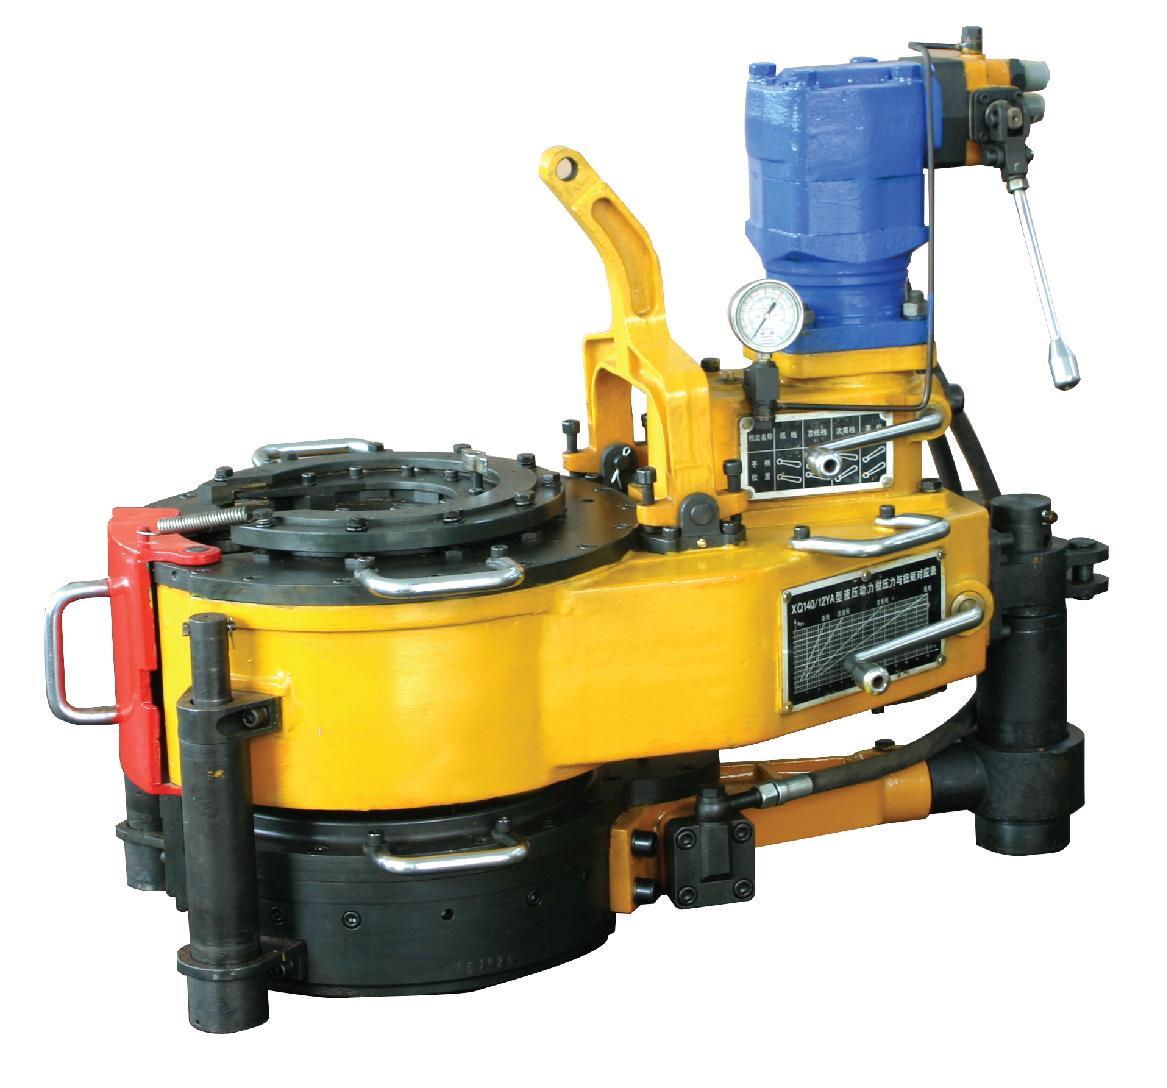 XYQ12 tubing power tong oil pipe hydraulic power tong